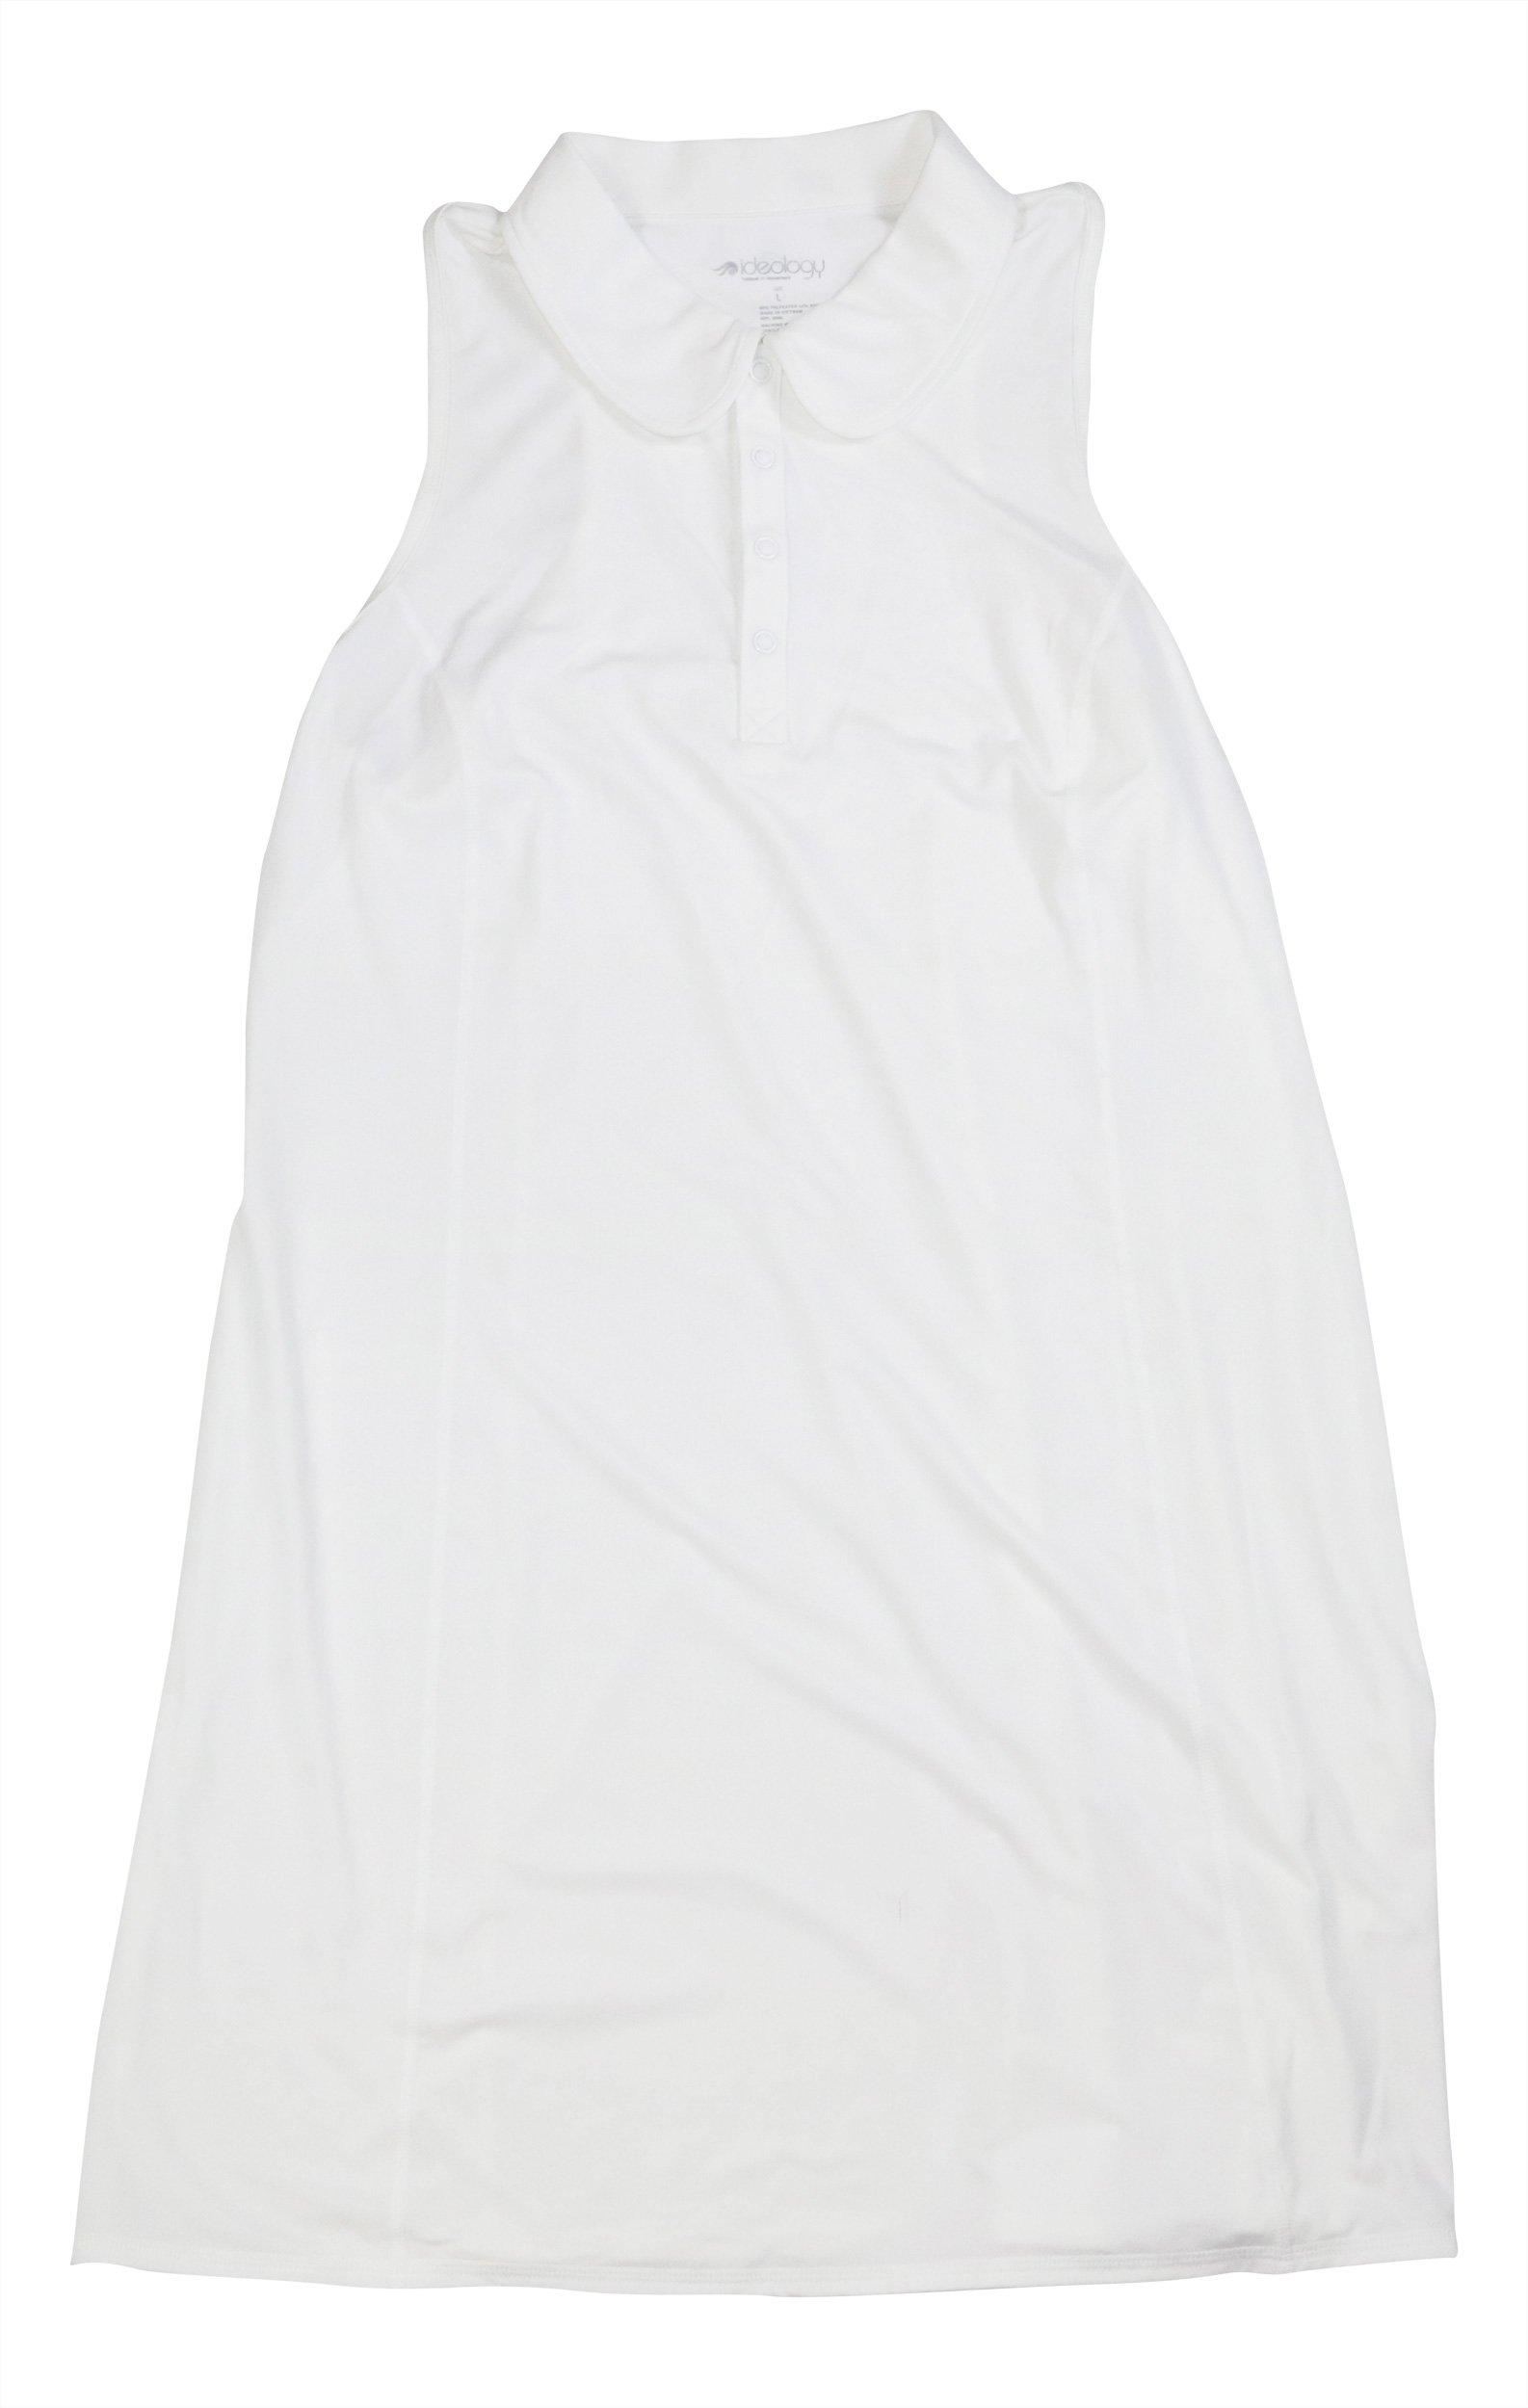 Ideology Women's Polo Tennis Dress (Bright White, Large)